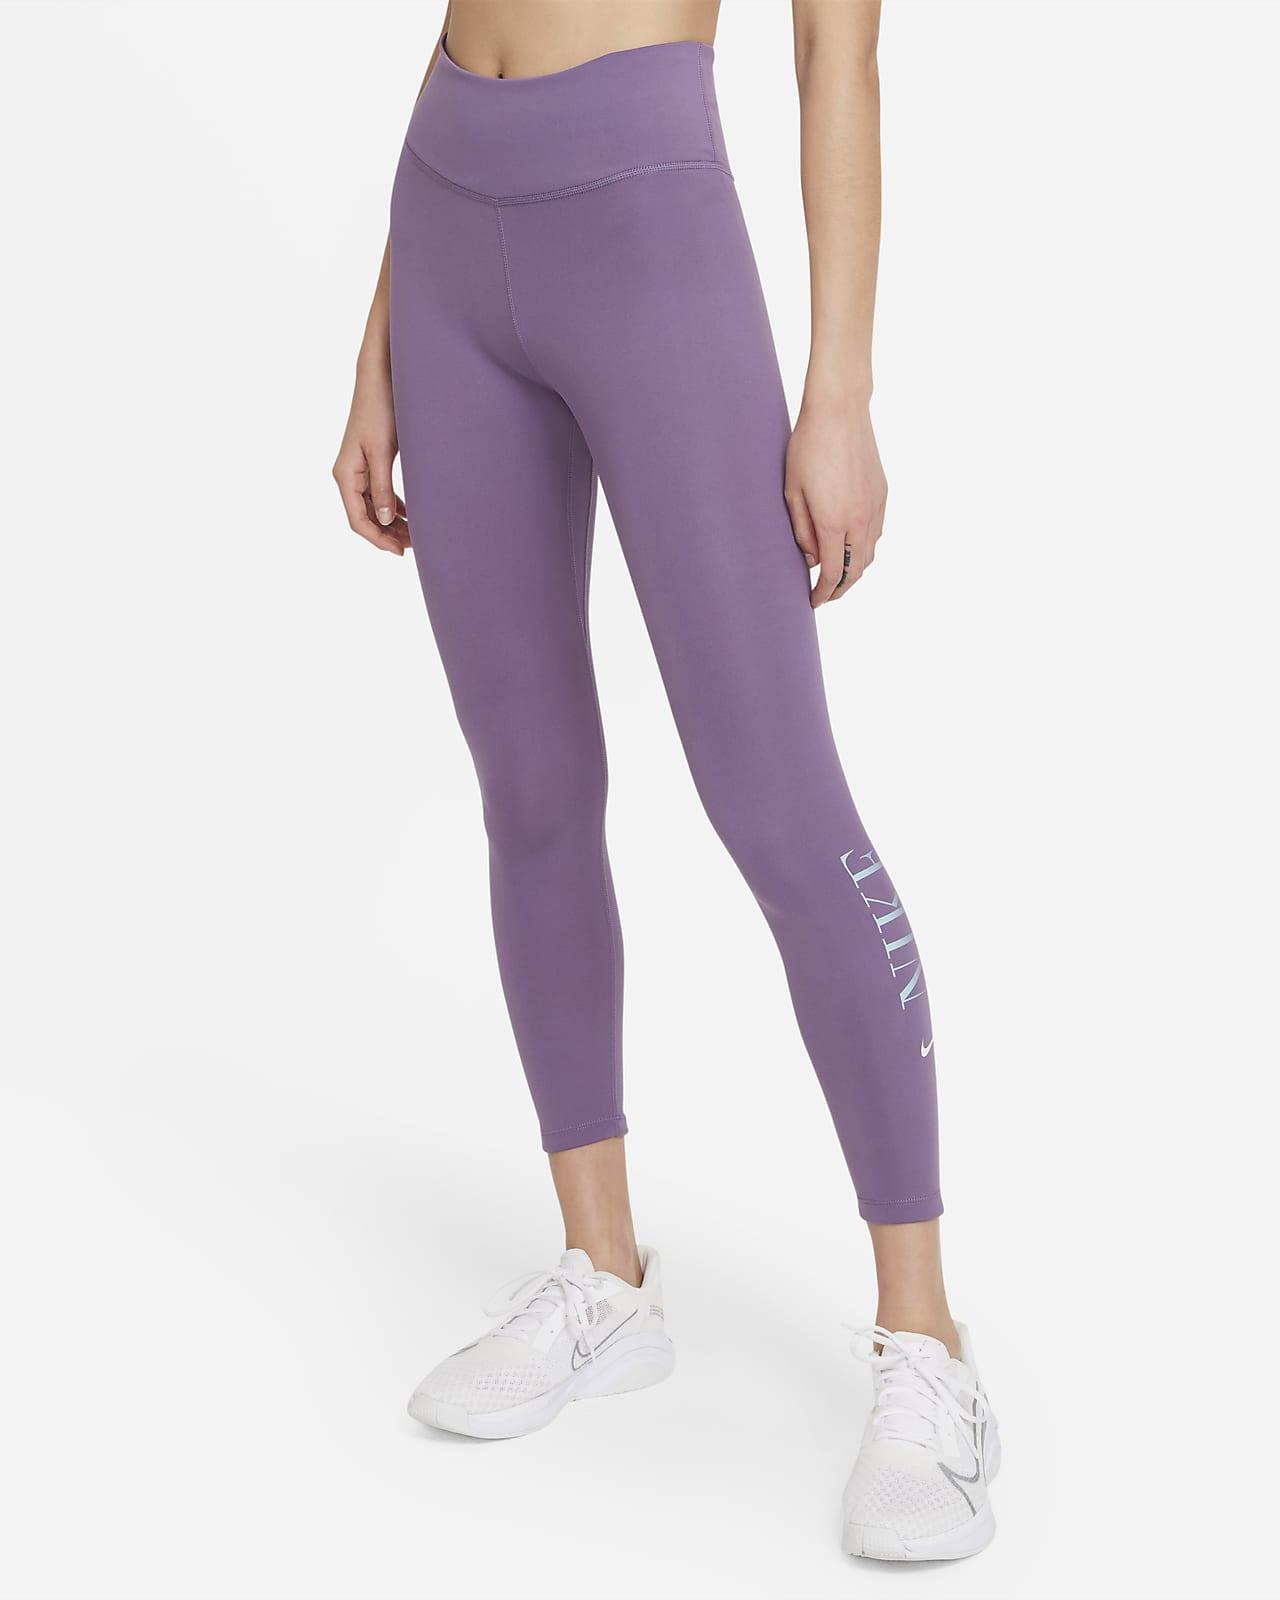 Nike Dri-FIT One 女款中腰九分圖樣內搭褲